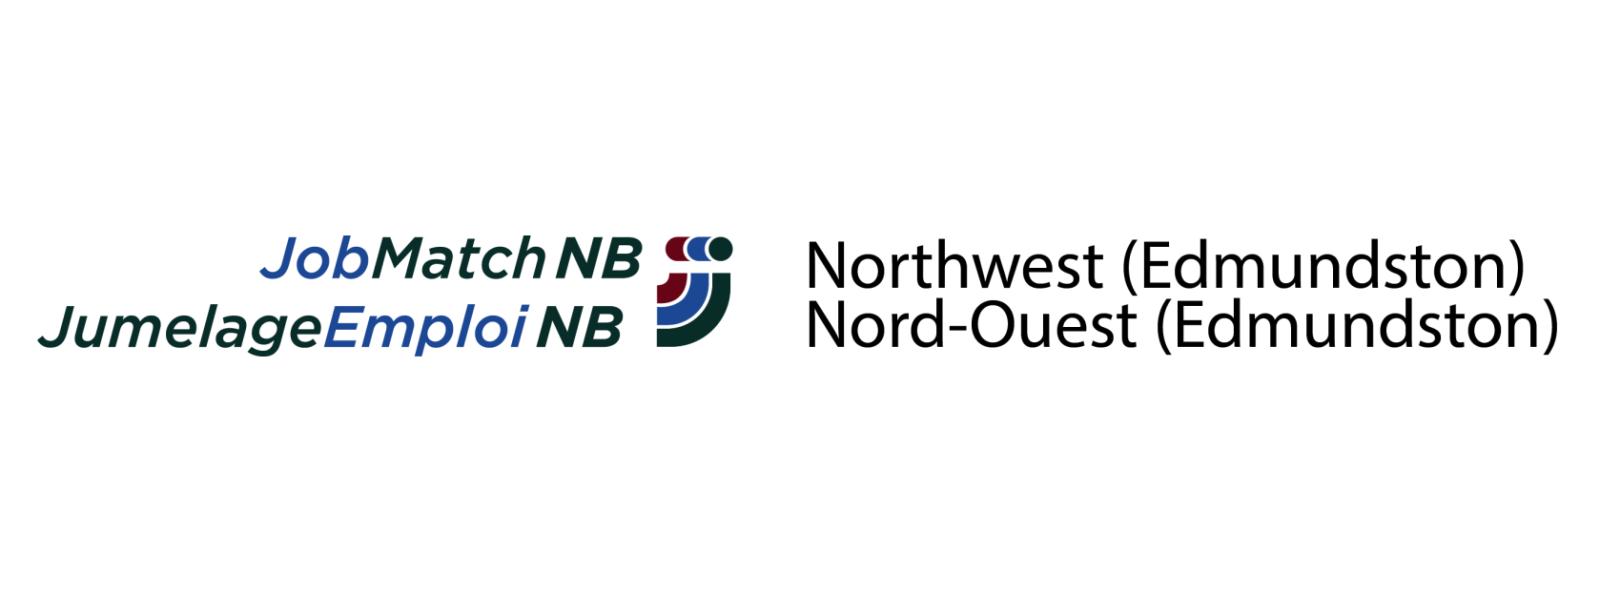 North-West (Edmundston)